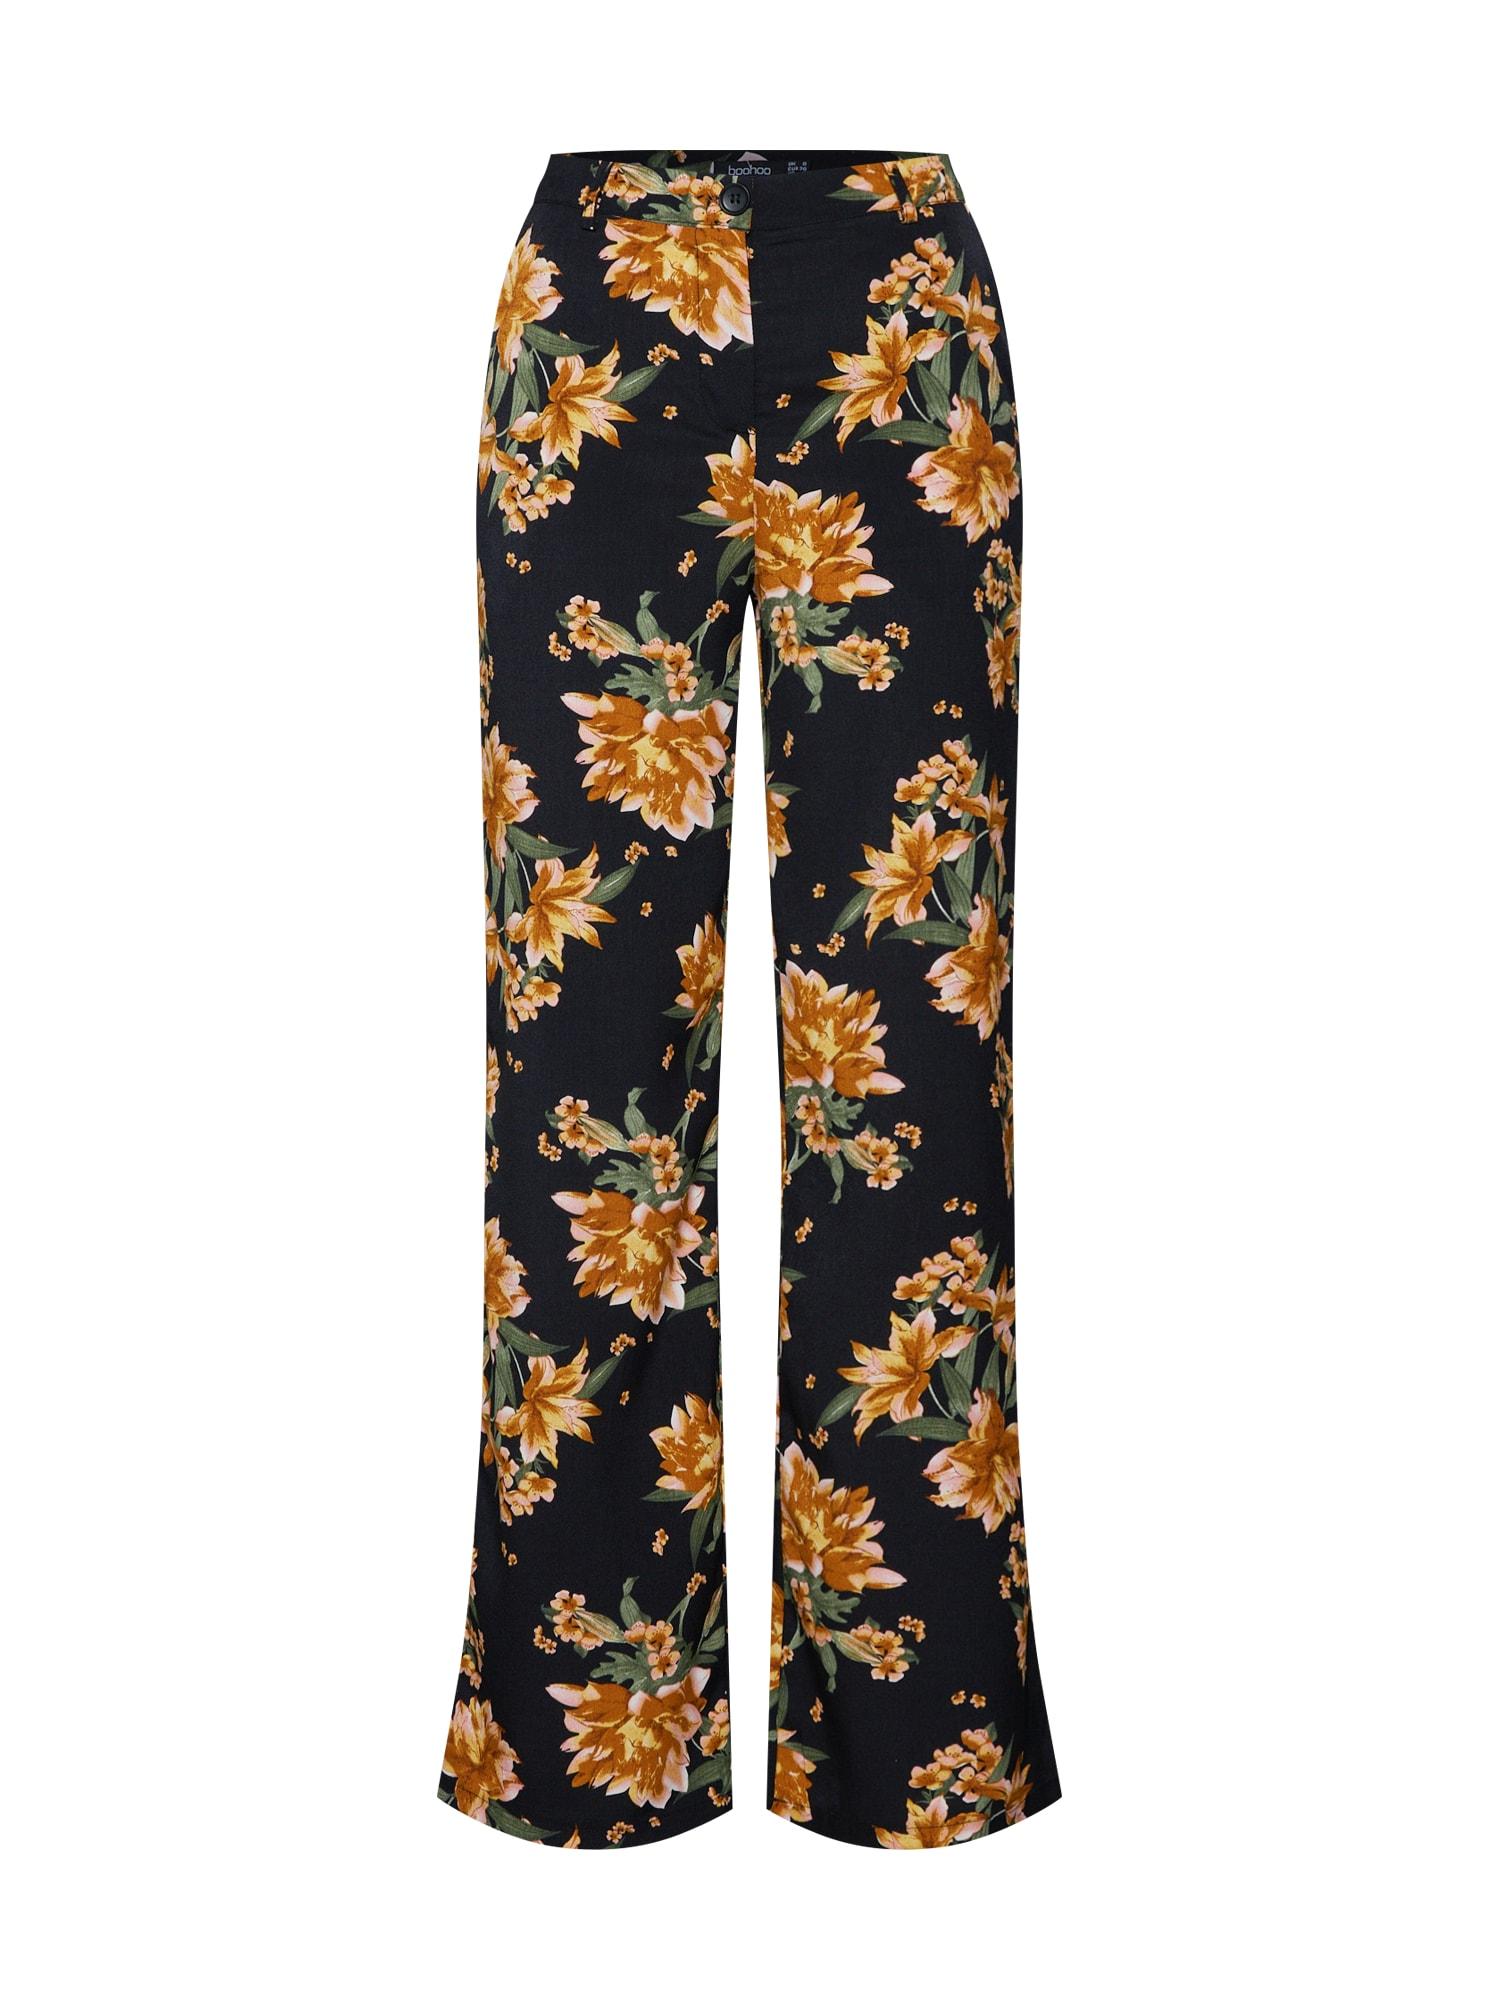 Kalhoty Floral Trouser gelb schwarz Boohoo